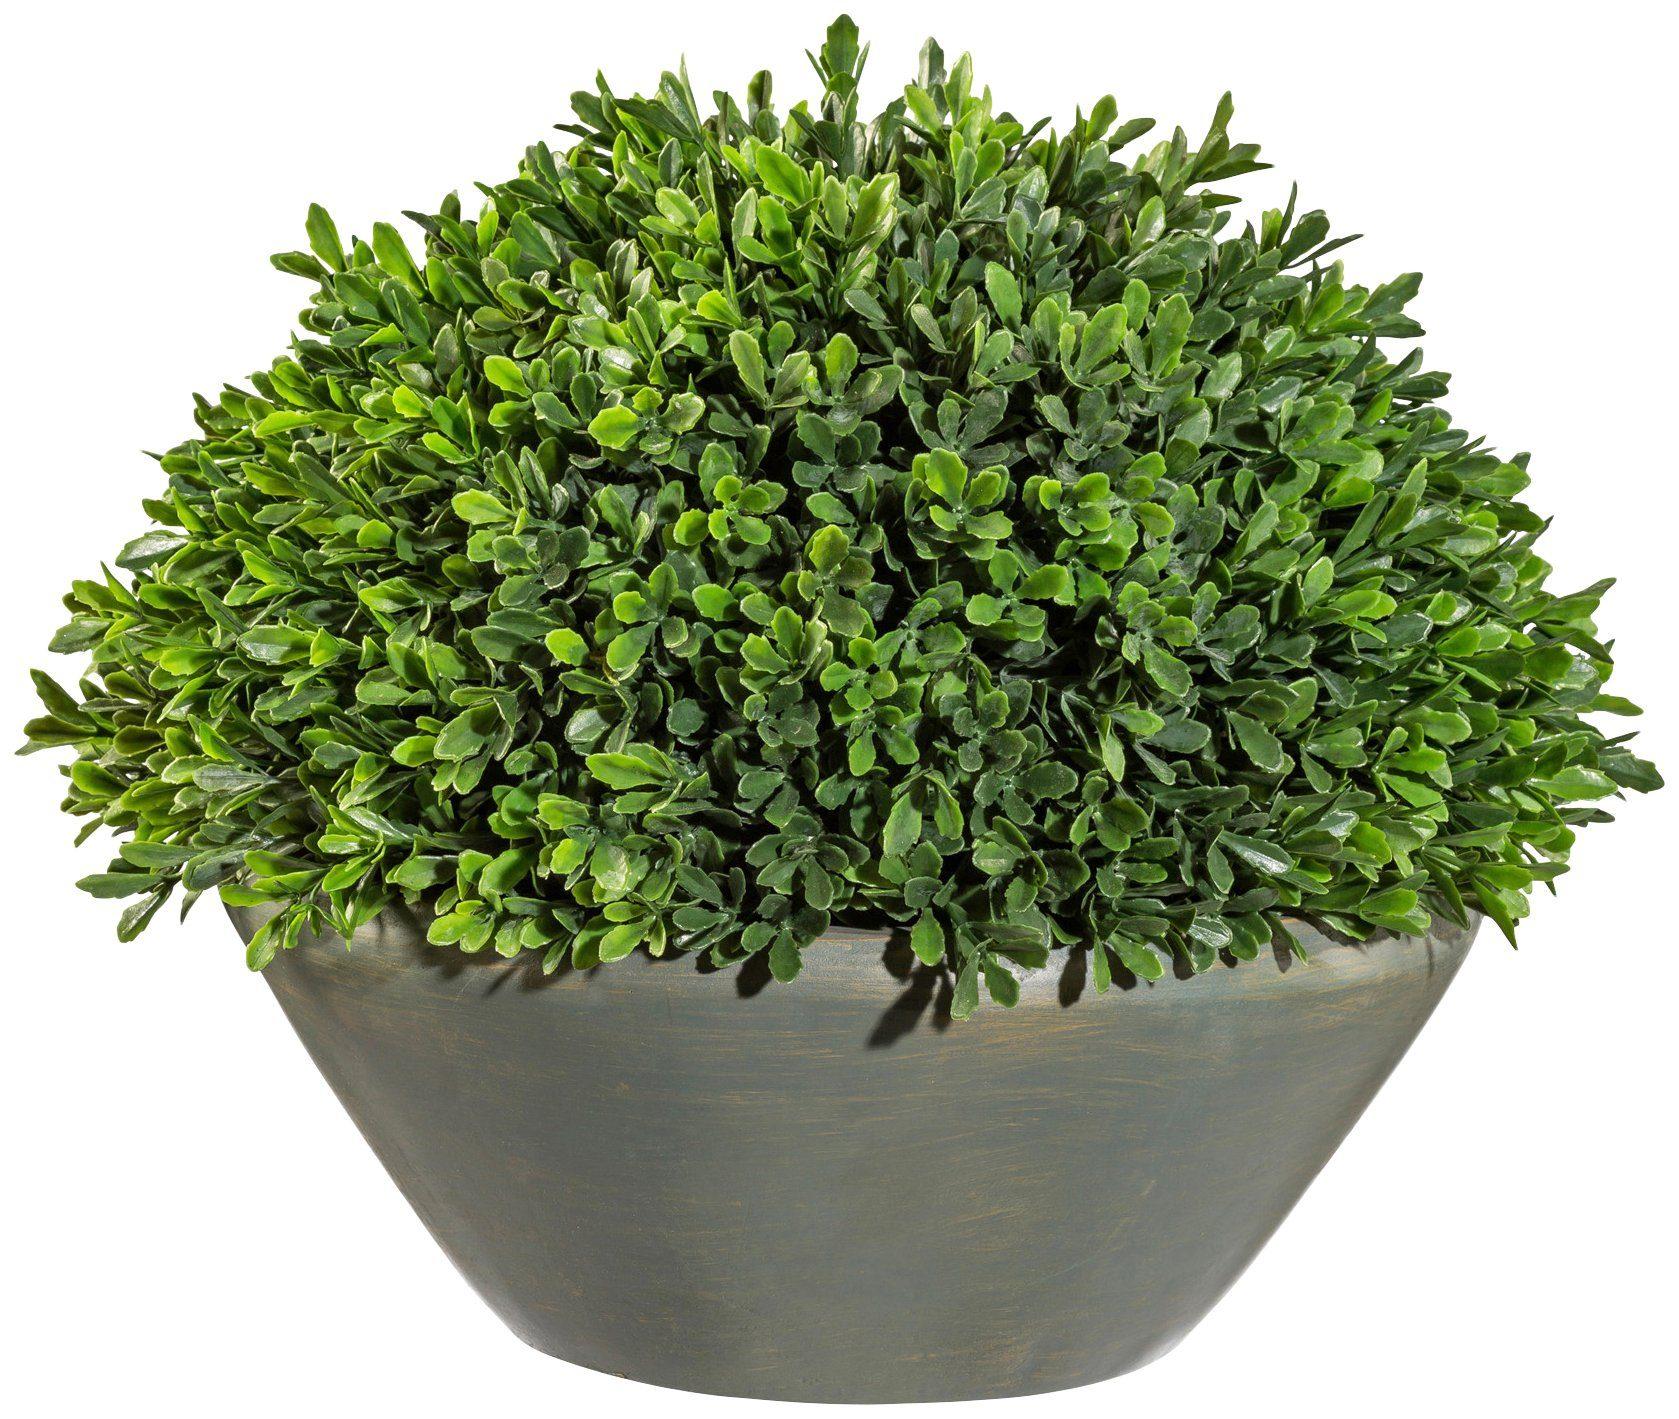 Kunstpflanze »Buchsbaum Halbkugel«, im Zementtopf, Höhe 38 cm